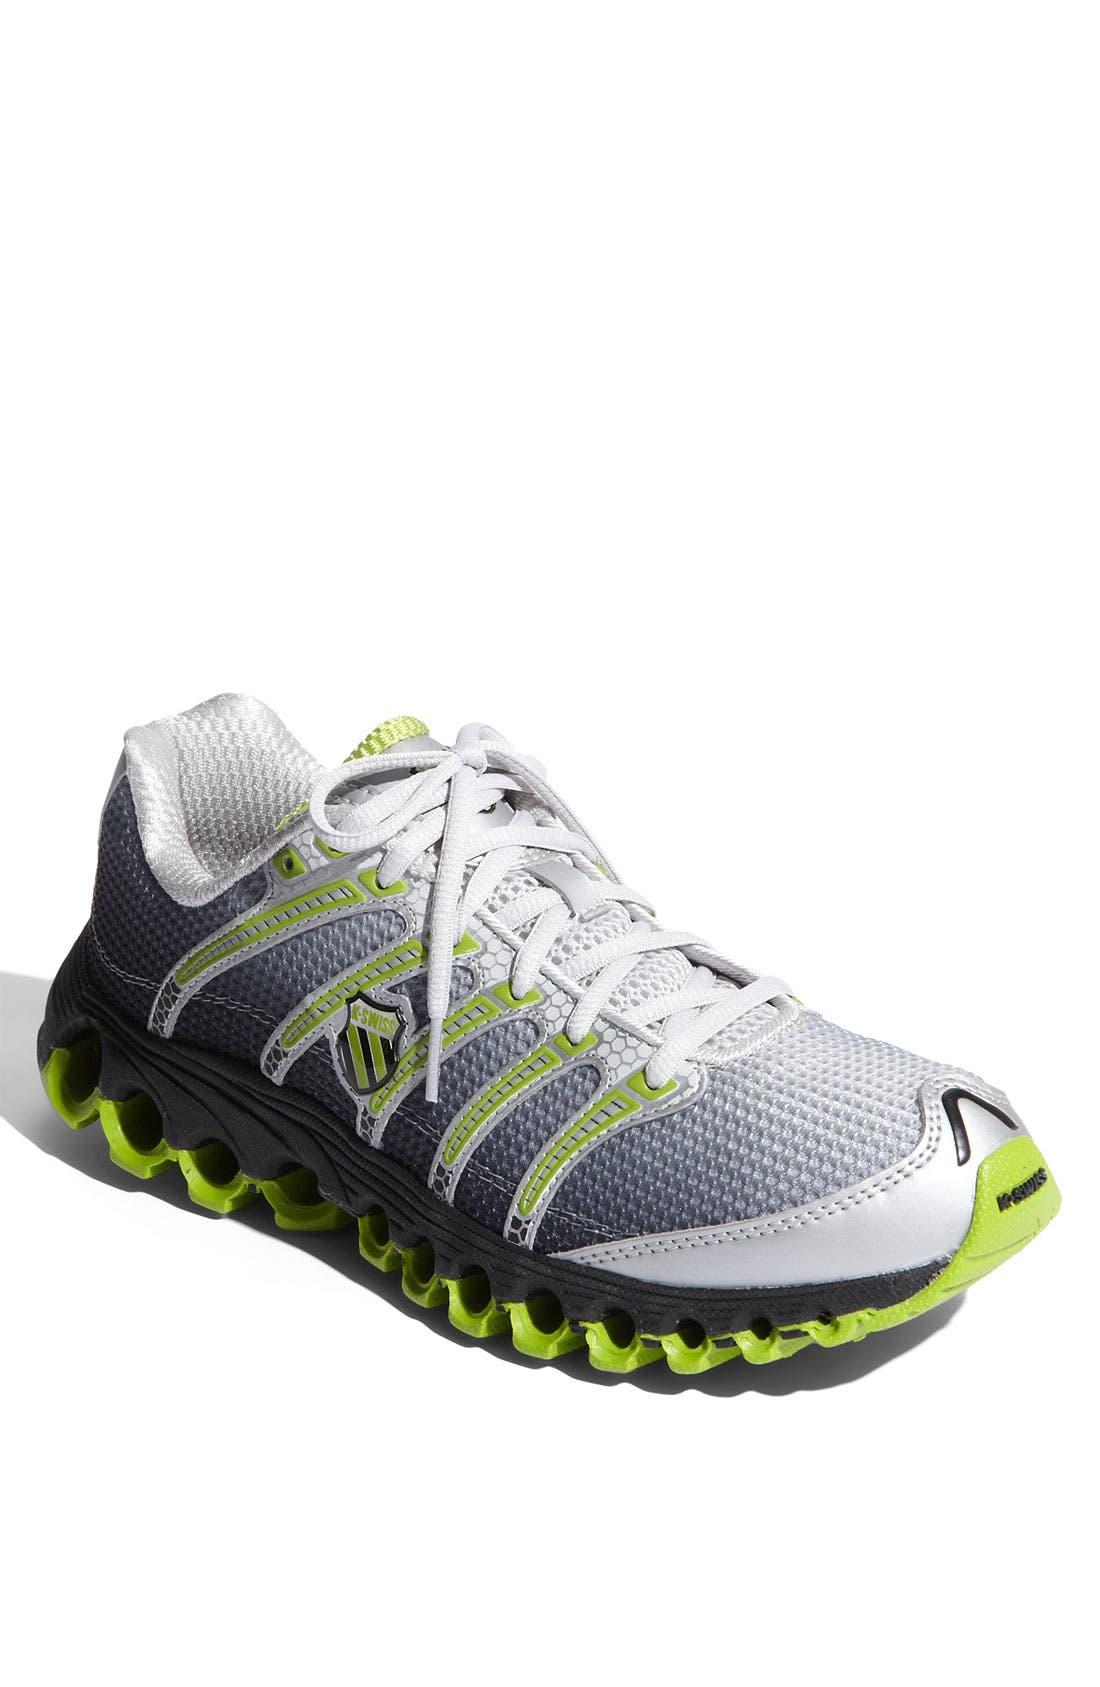 Alternate Image 1 Selected - K-Swiss 'Tubes 100' Running Shoe (Men)